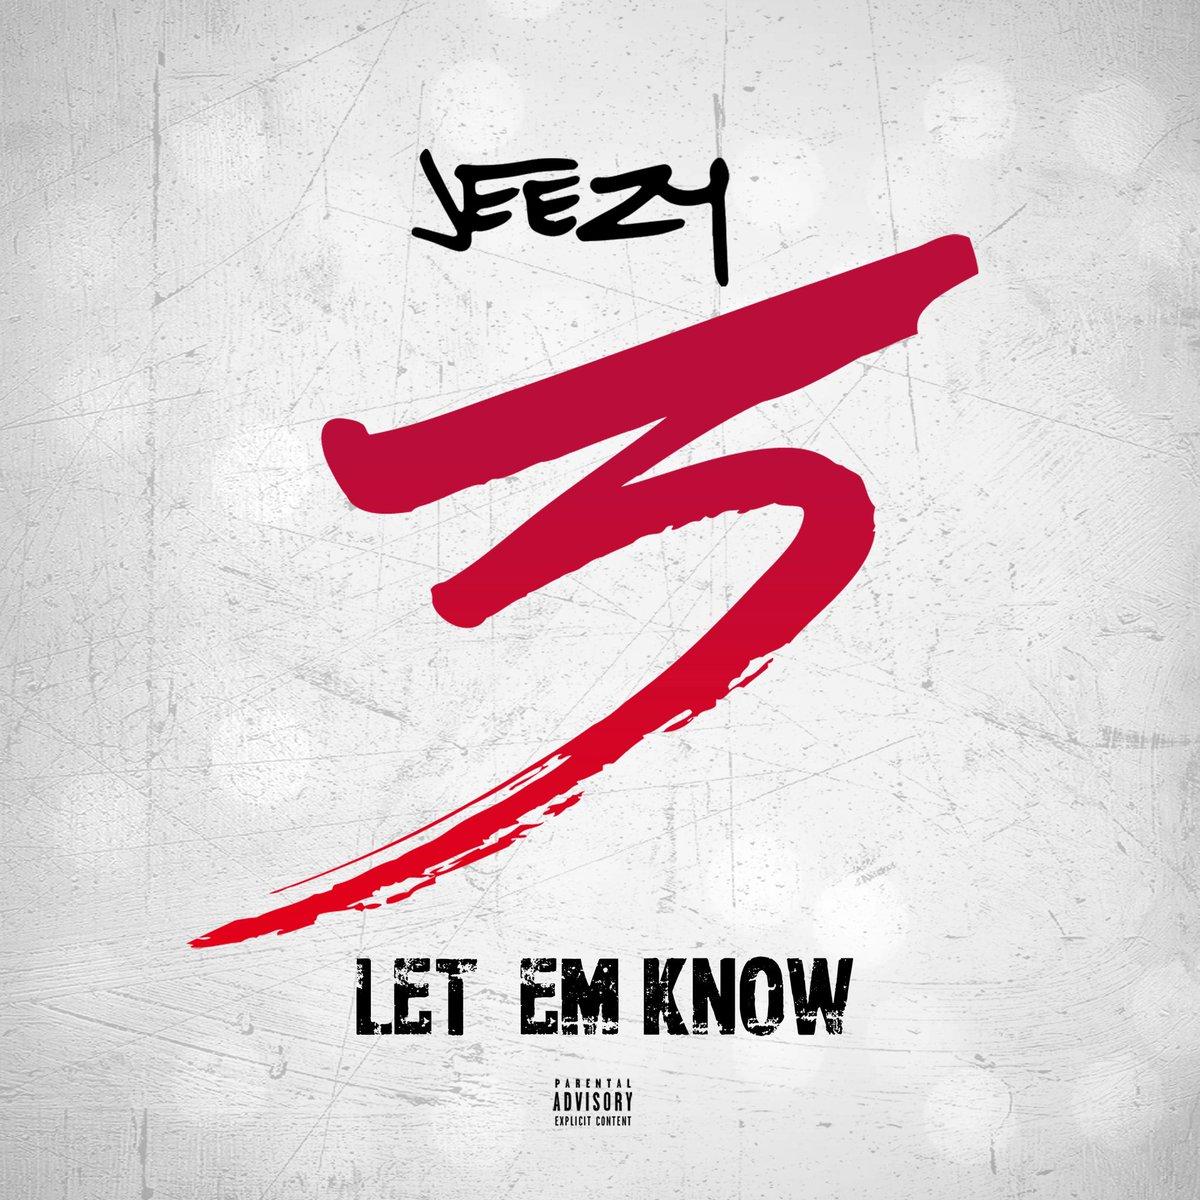 jeezy let em know